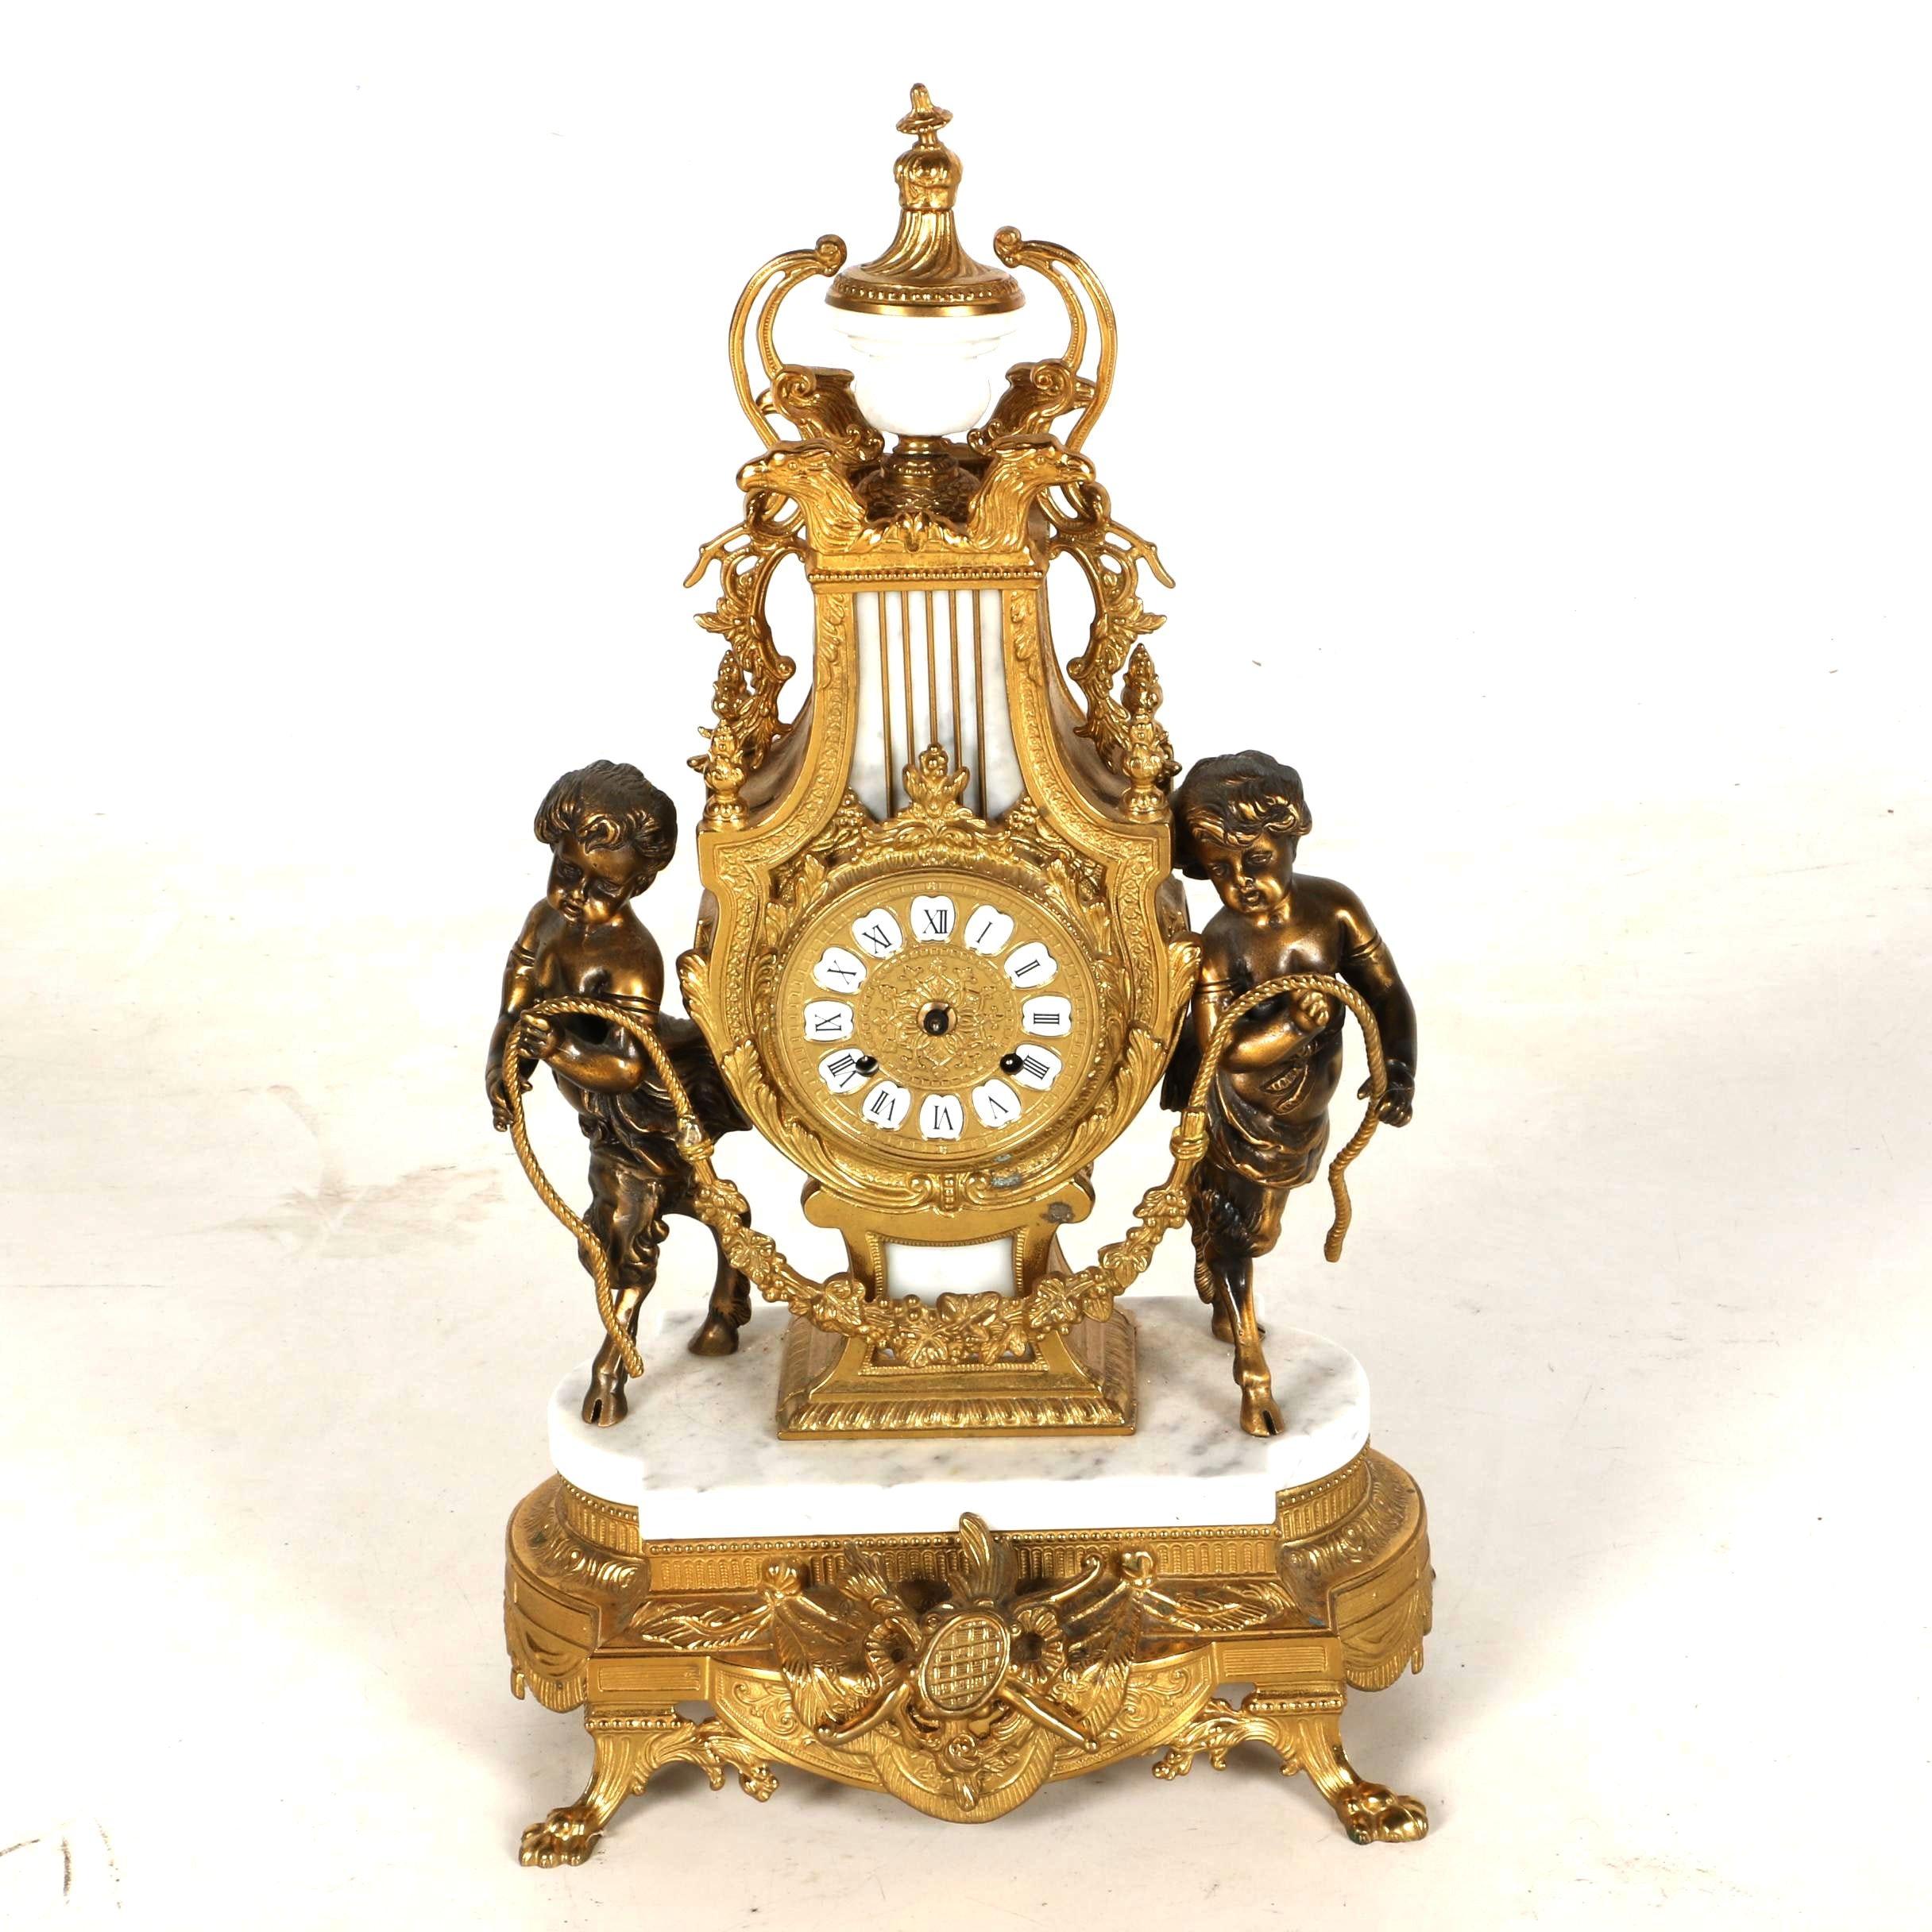 lancini italian brass bronze and marble mantle clock - Mantle Clock